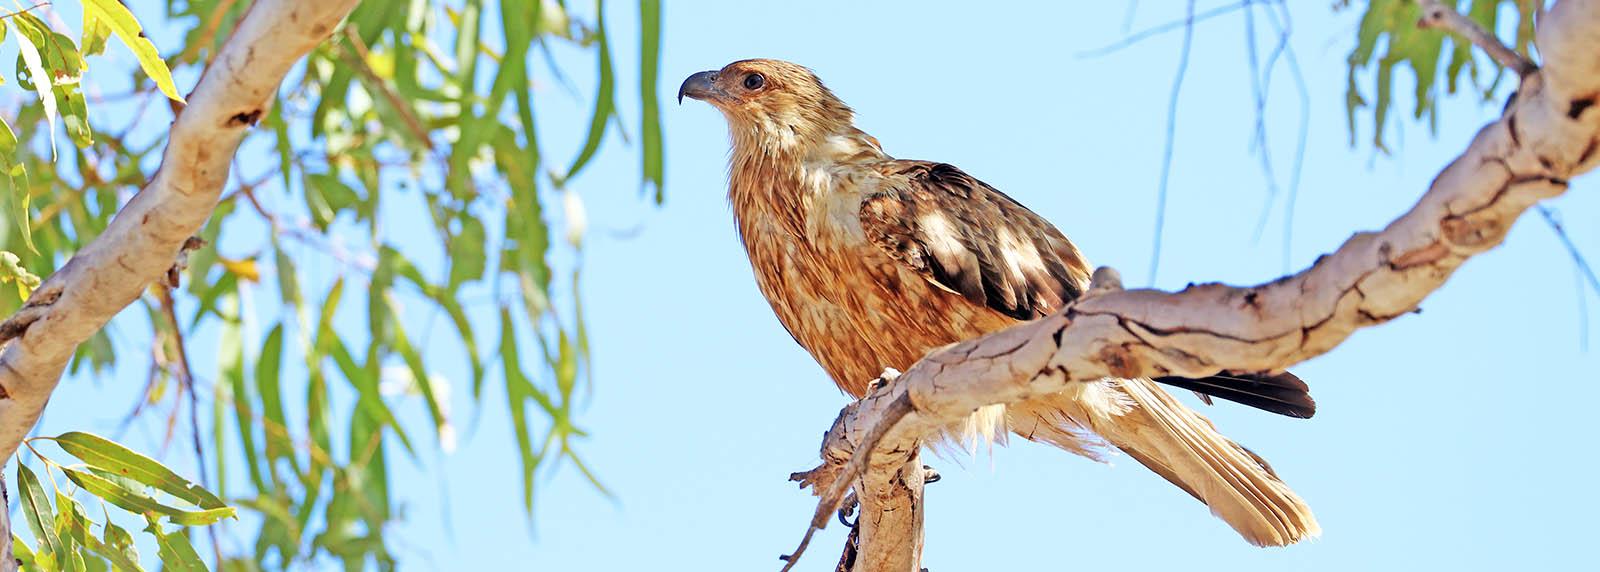 Whistling Kite (image by Damon Ramsey)